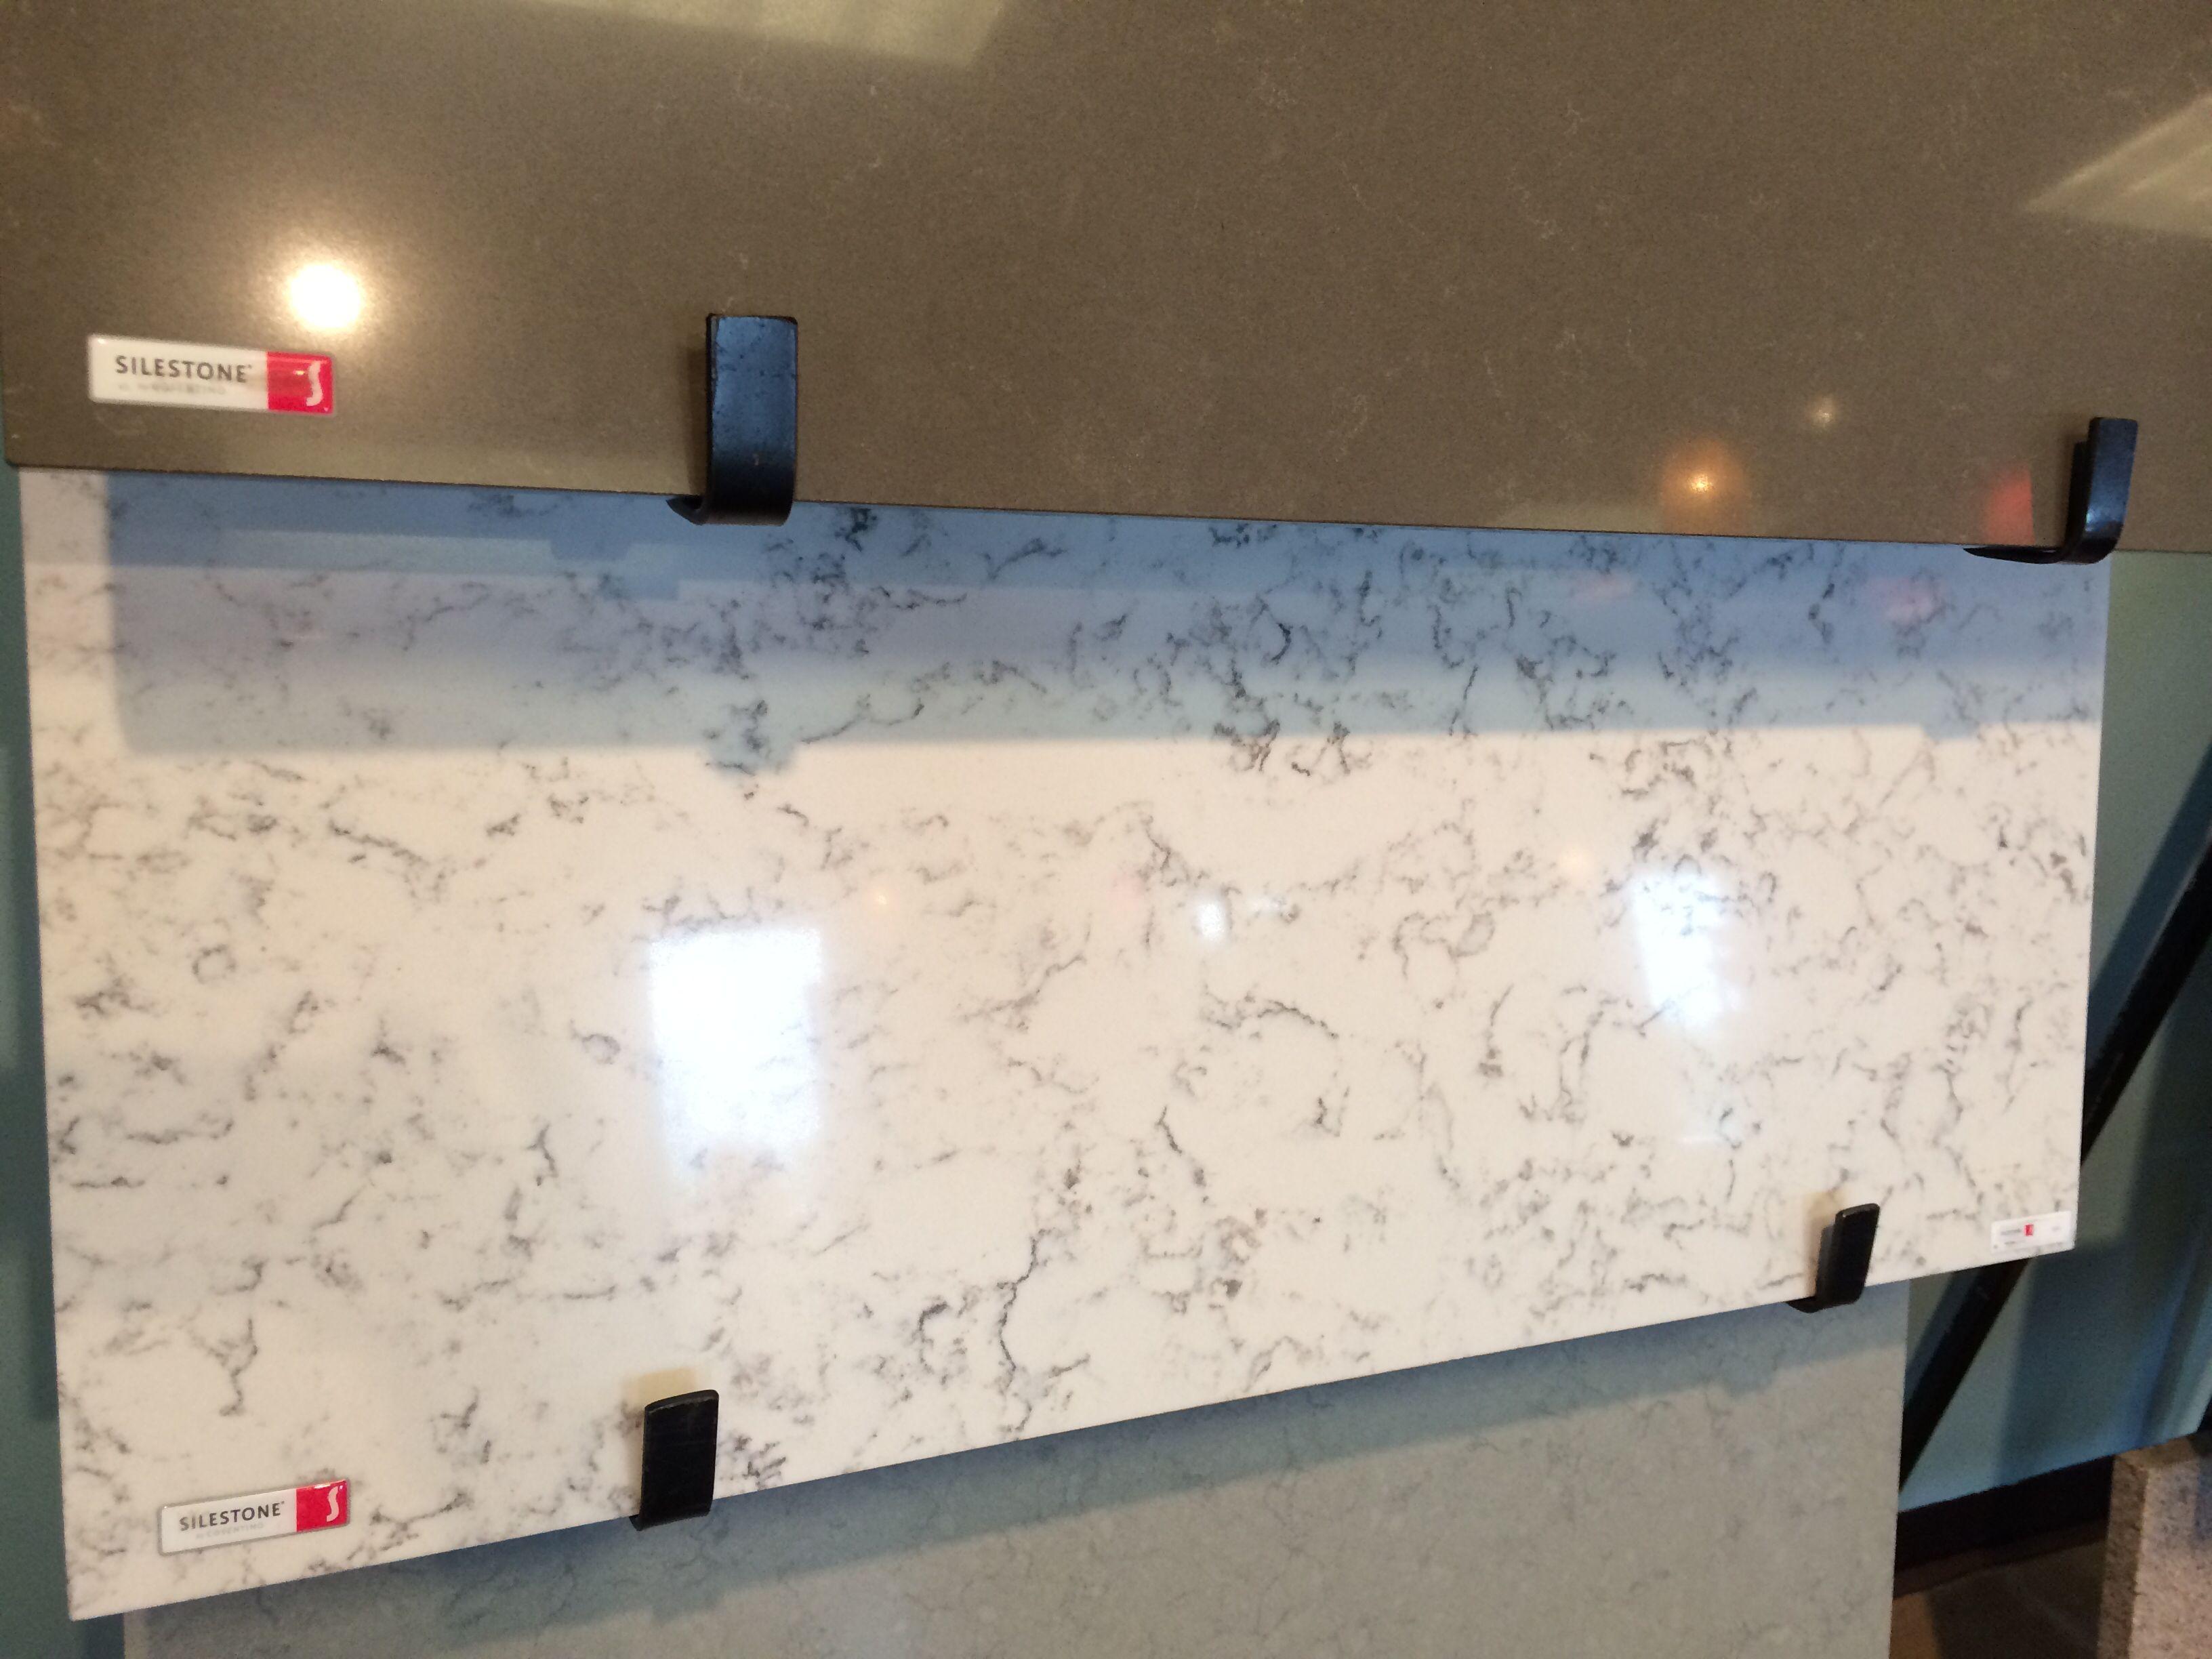 Silestone Quartz in Color: Lyra | Cocinas | Pinterest | Cocinas